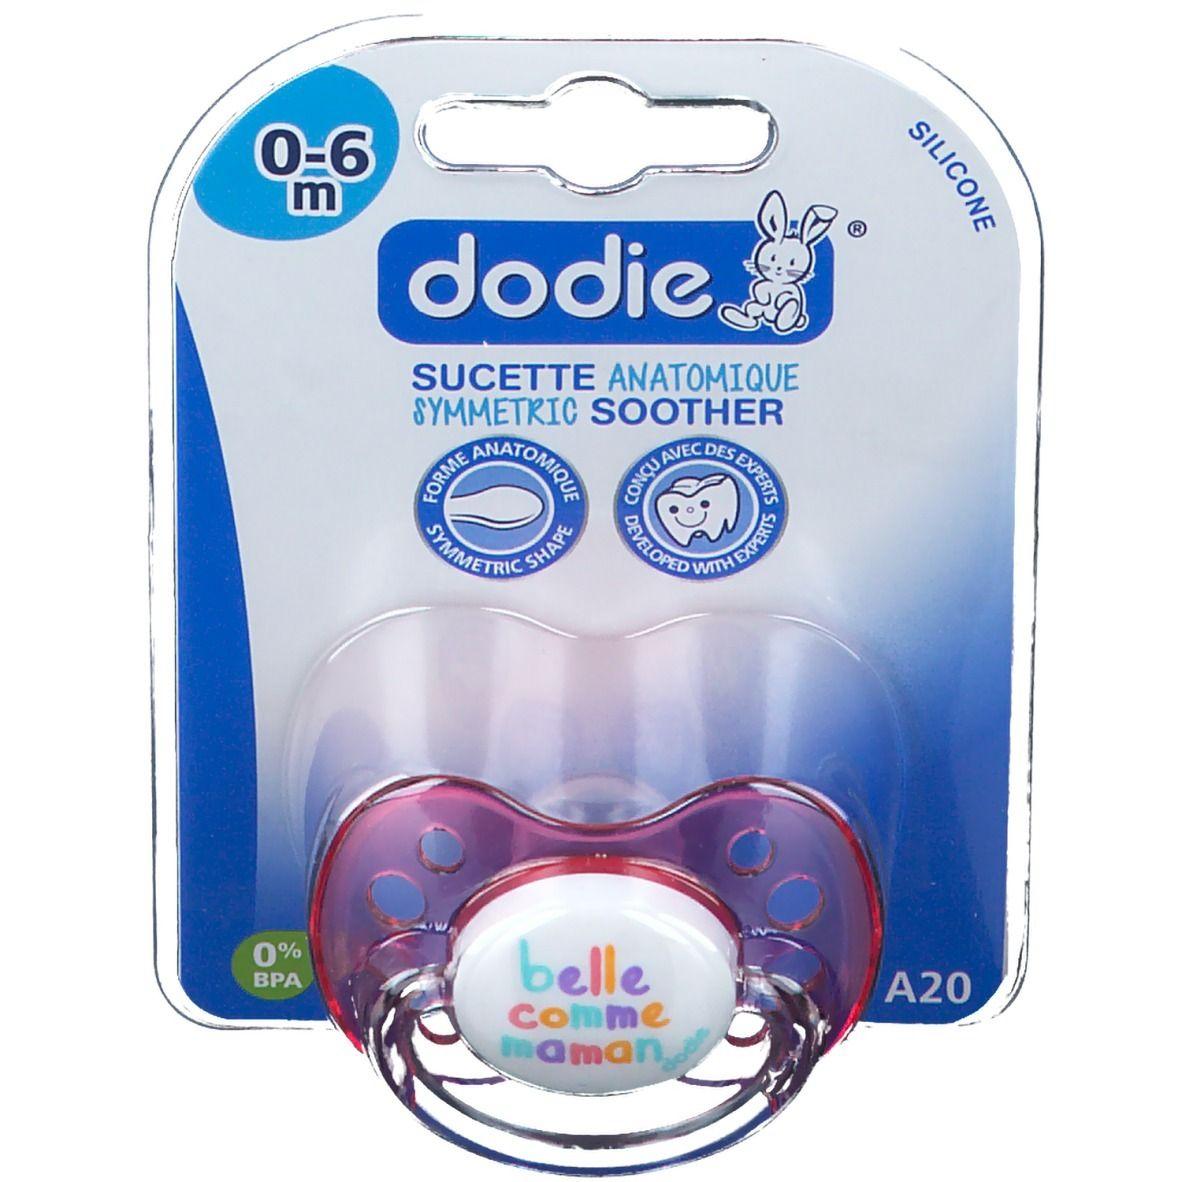 dodie® sucette anatomique silicone message 1er âge pc(s) Sucette(s)